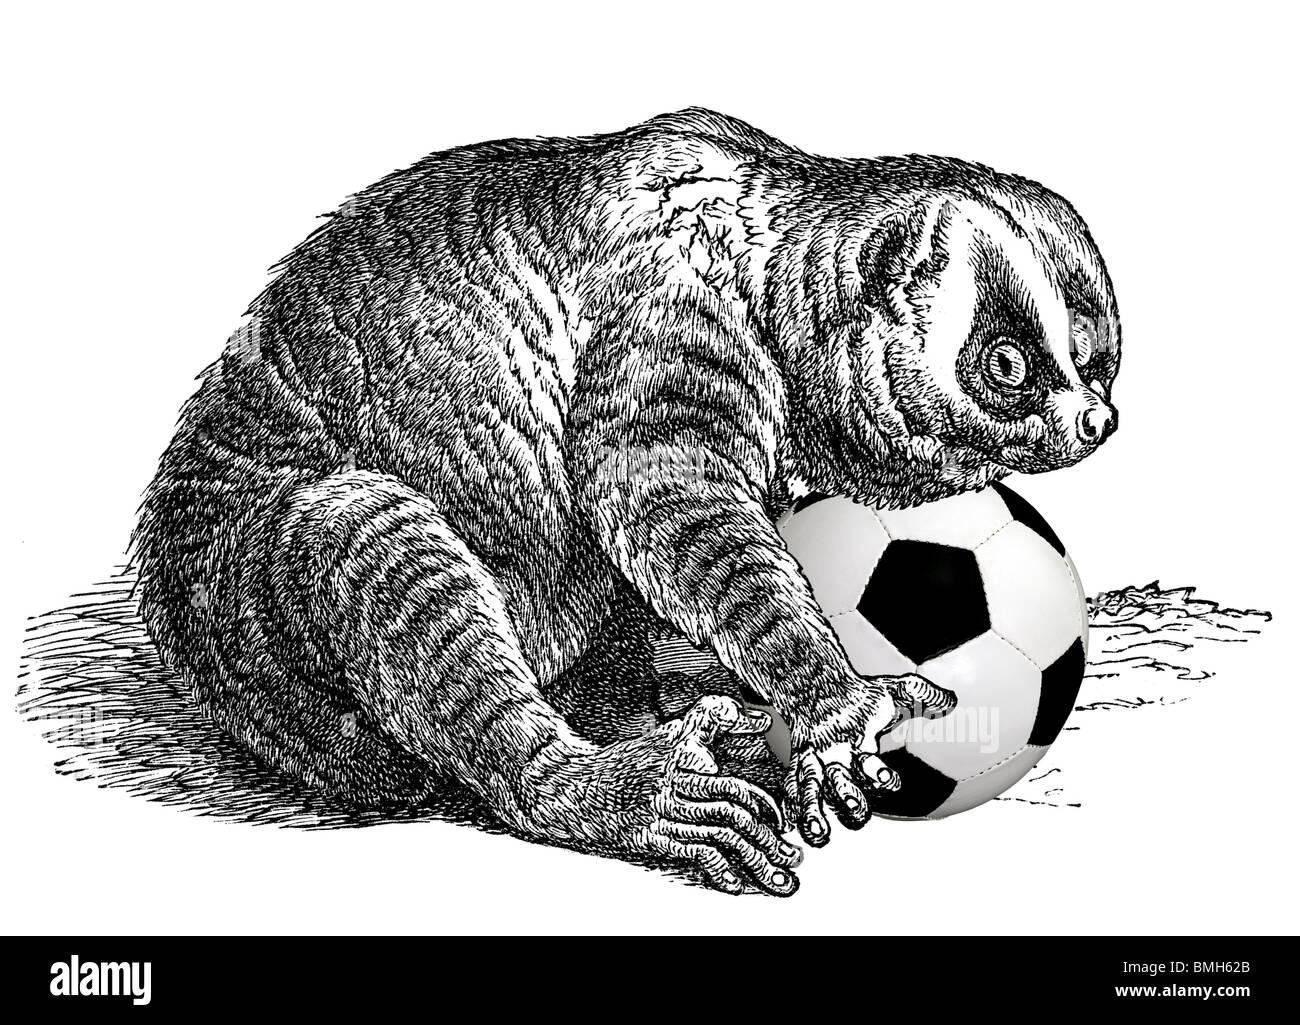 My football - Stock Image